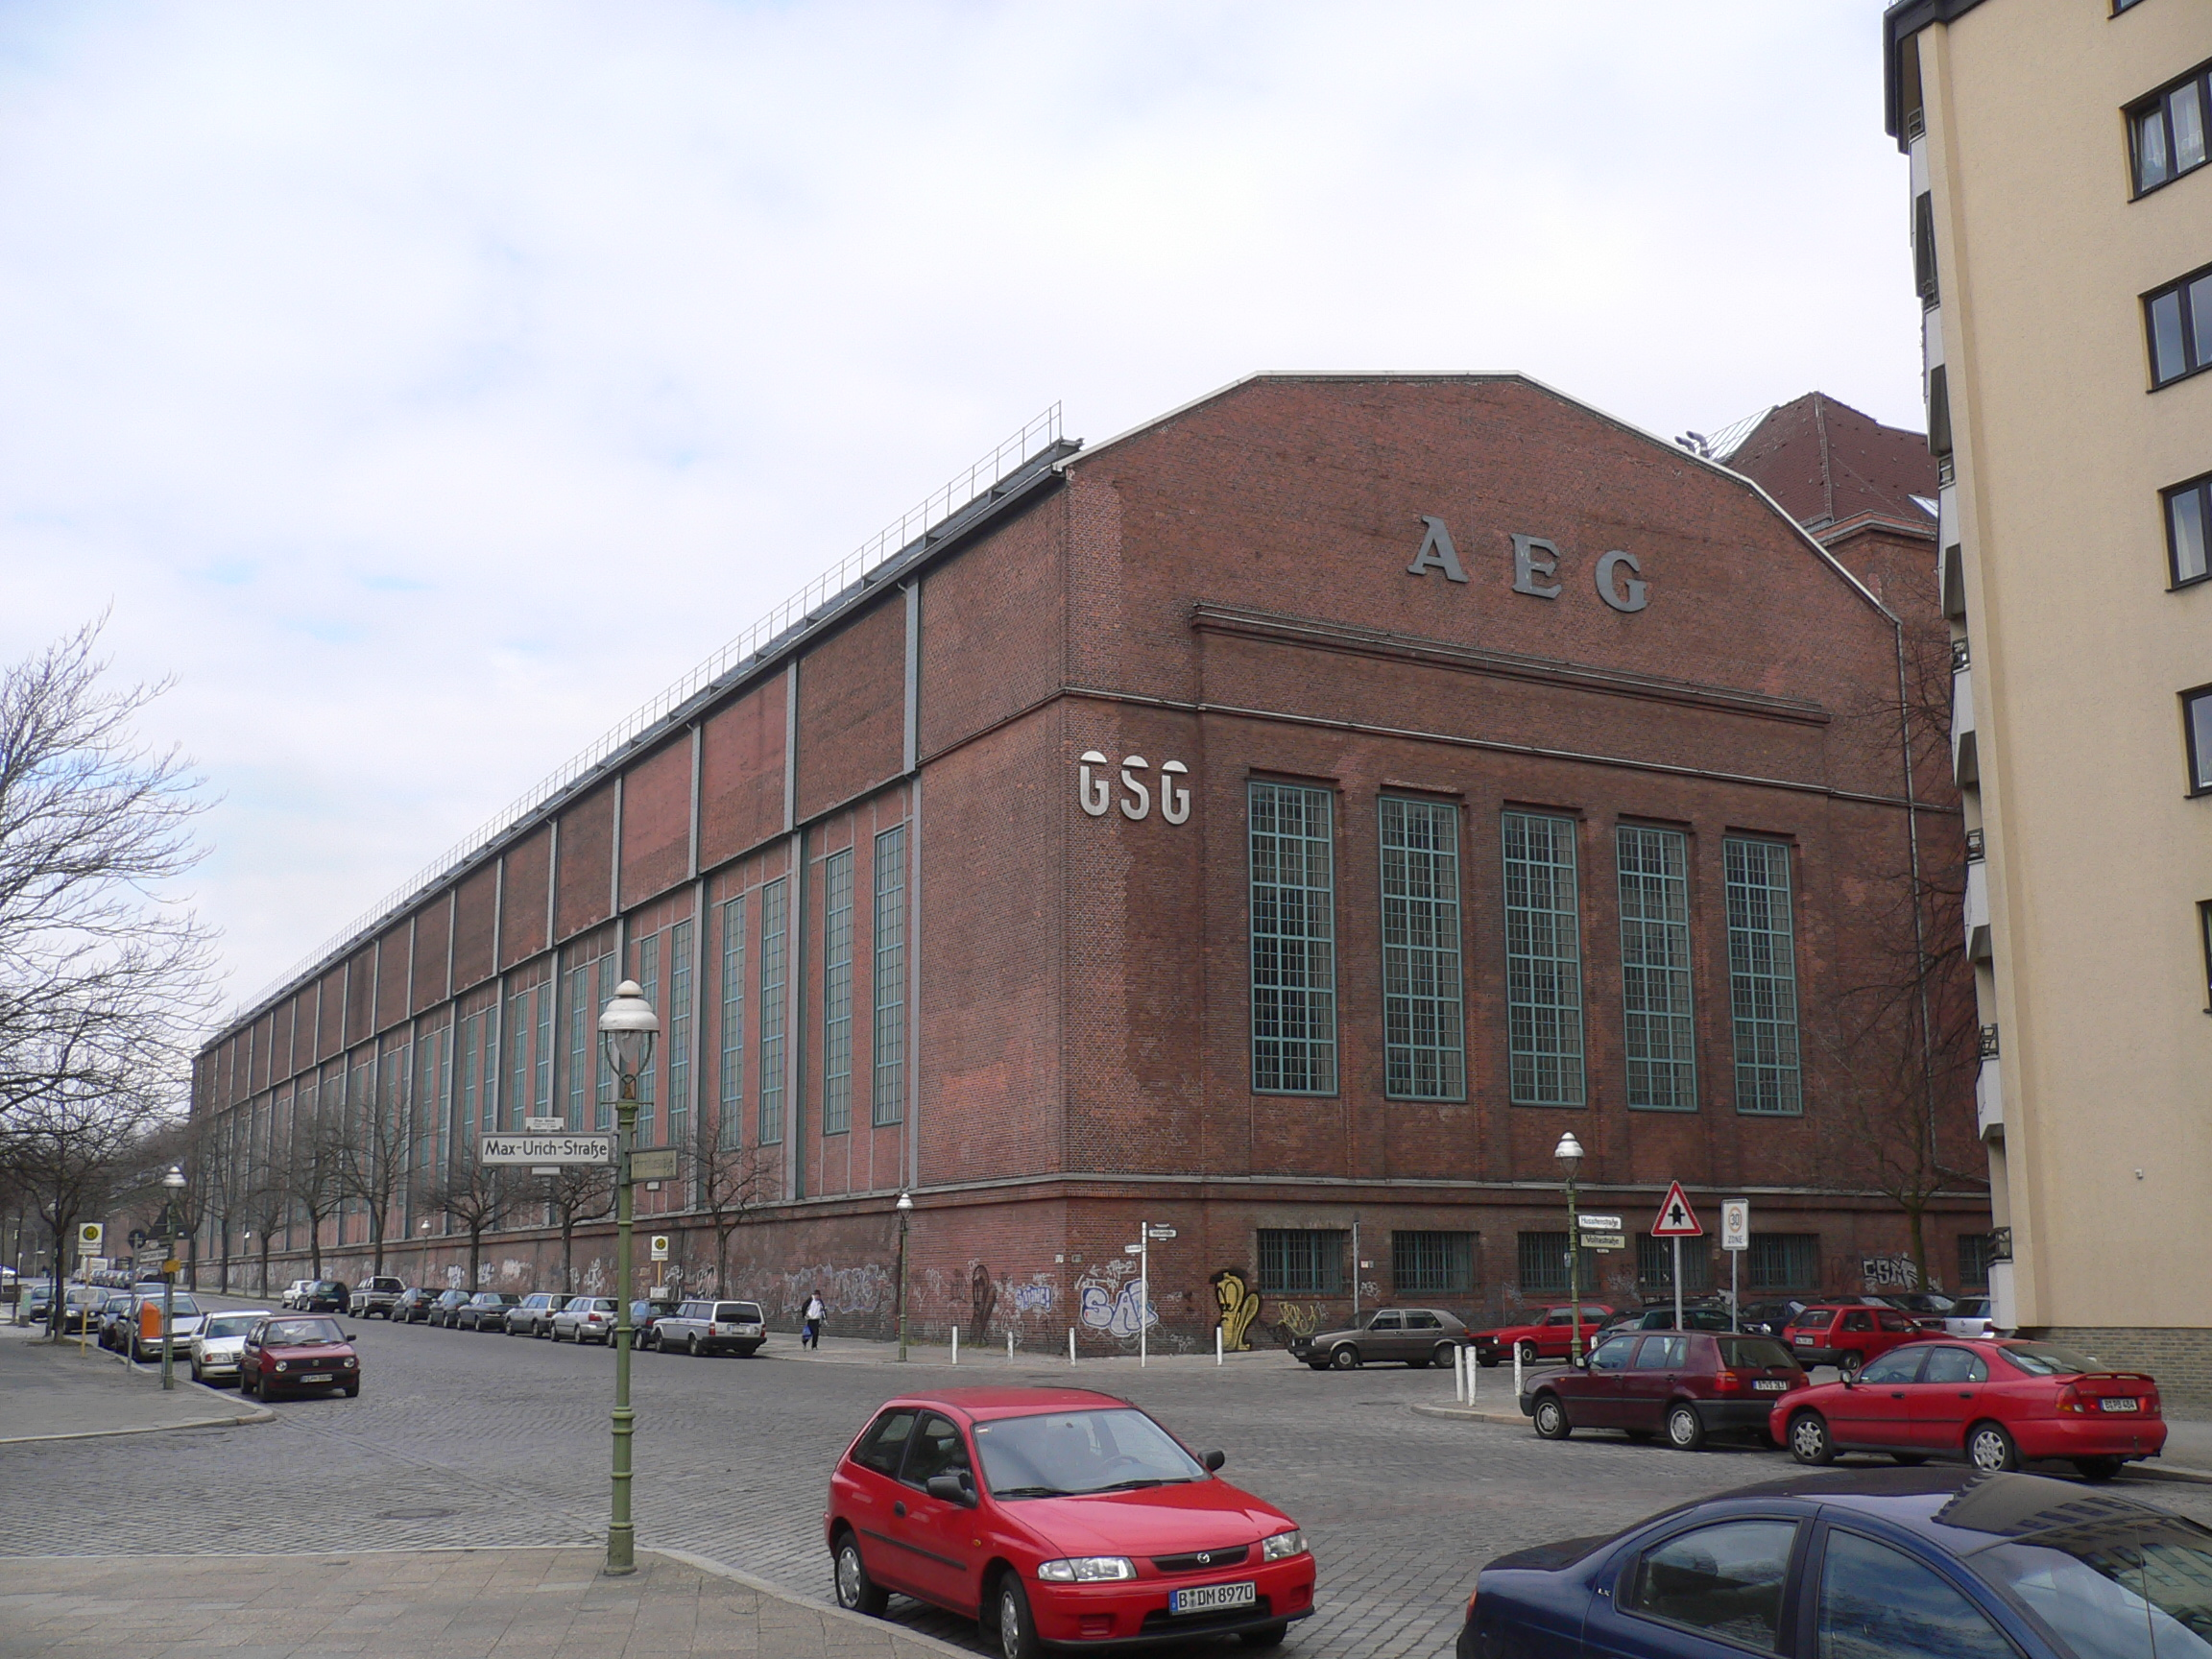 file aeg premises montagehalle f r gro maschinen berlin 2006 jpg wikimedia commons. Black Bedroom Furniture Sets. Home Design Ideas